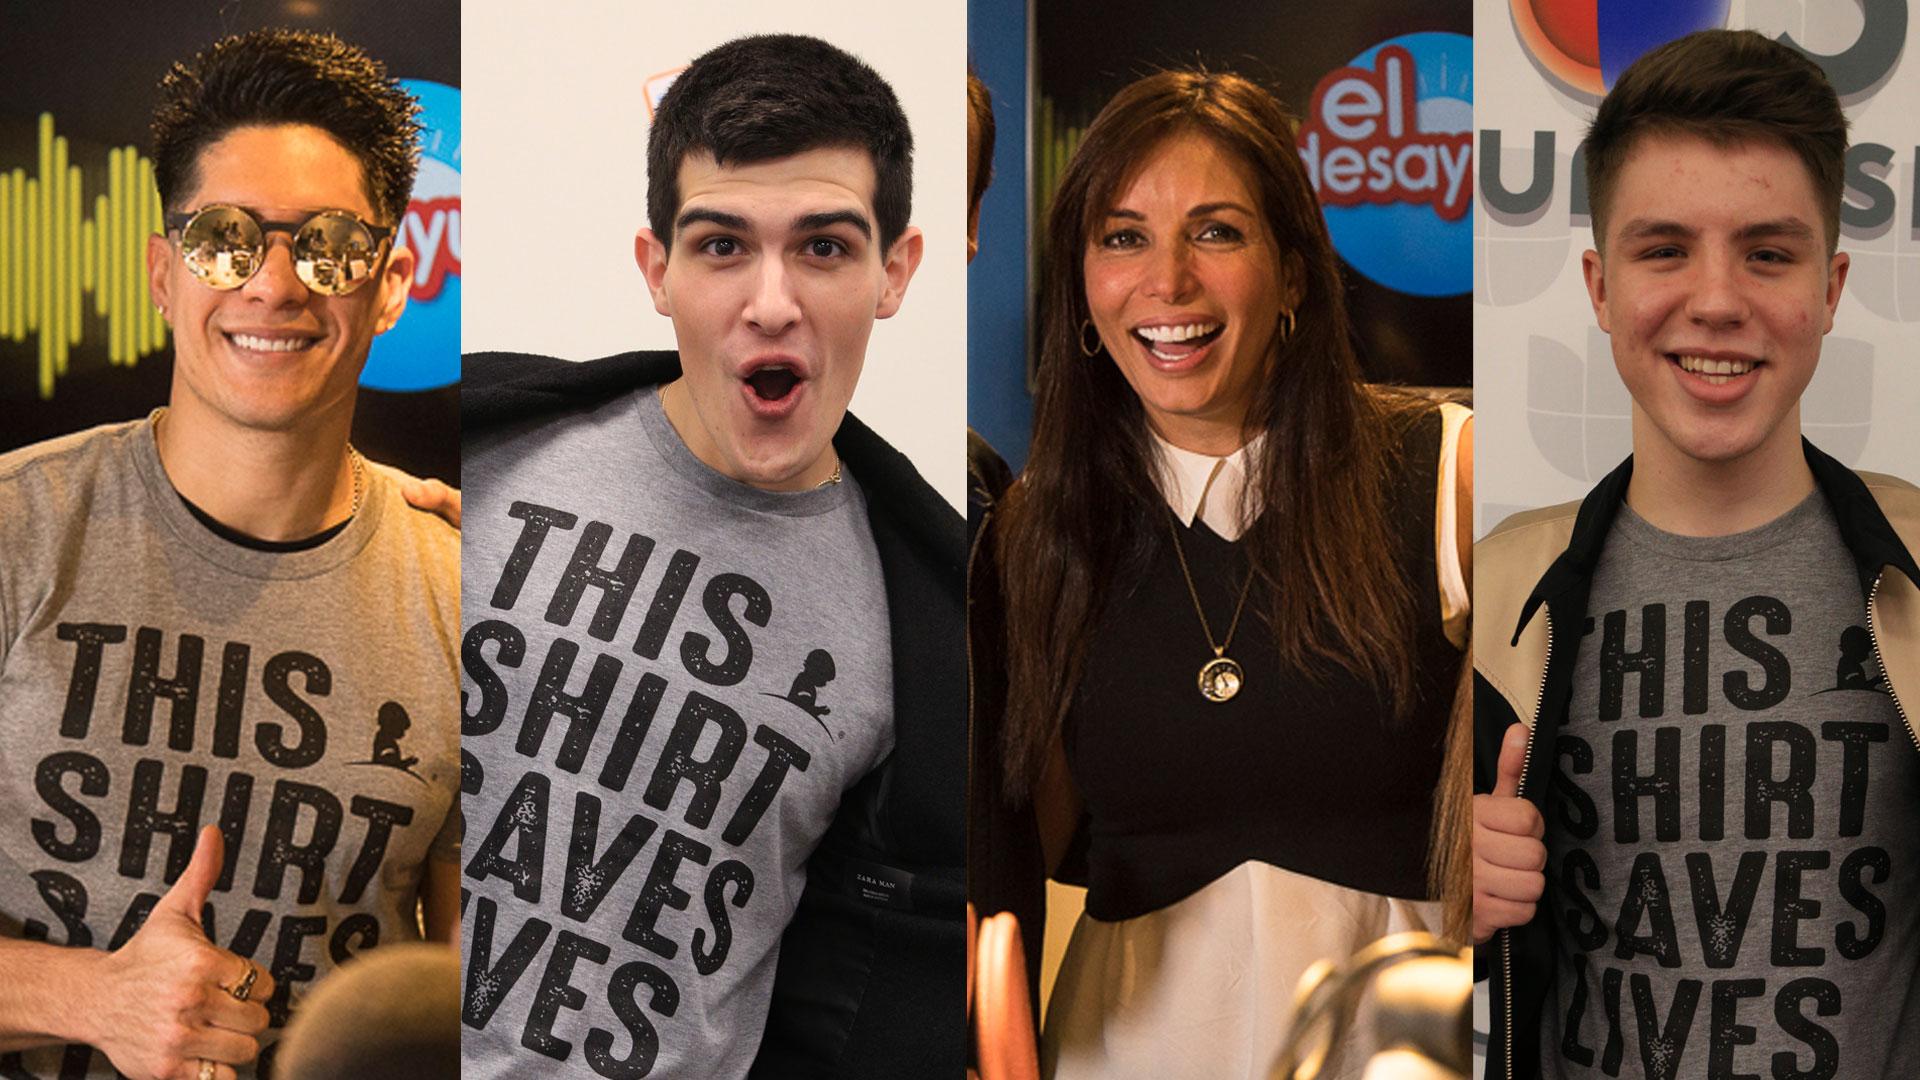 Artistas que ayudan a salvar vidas con #ThisShirtSavesLives de costa a costa